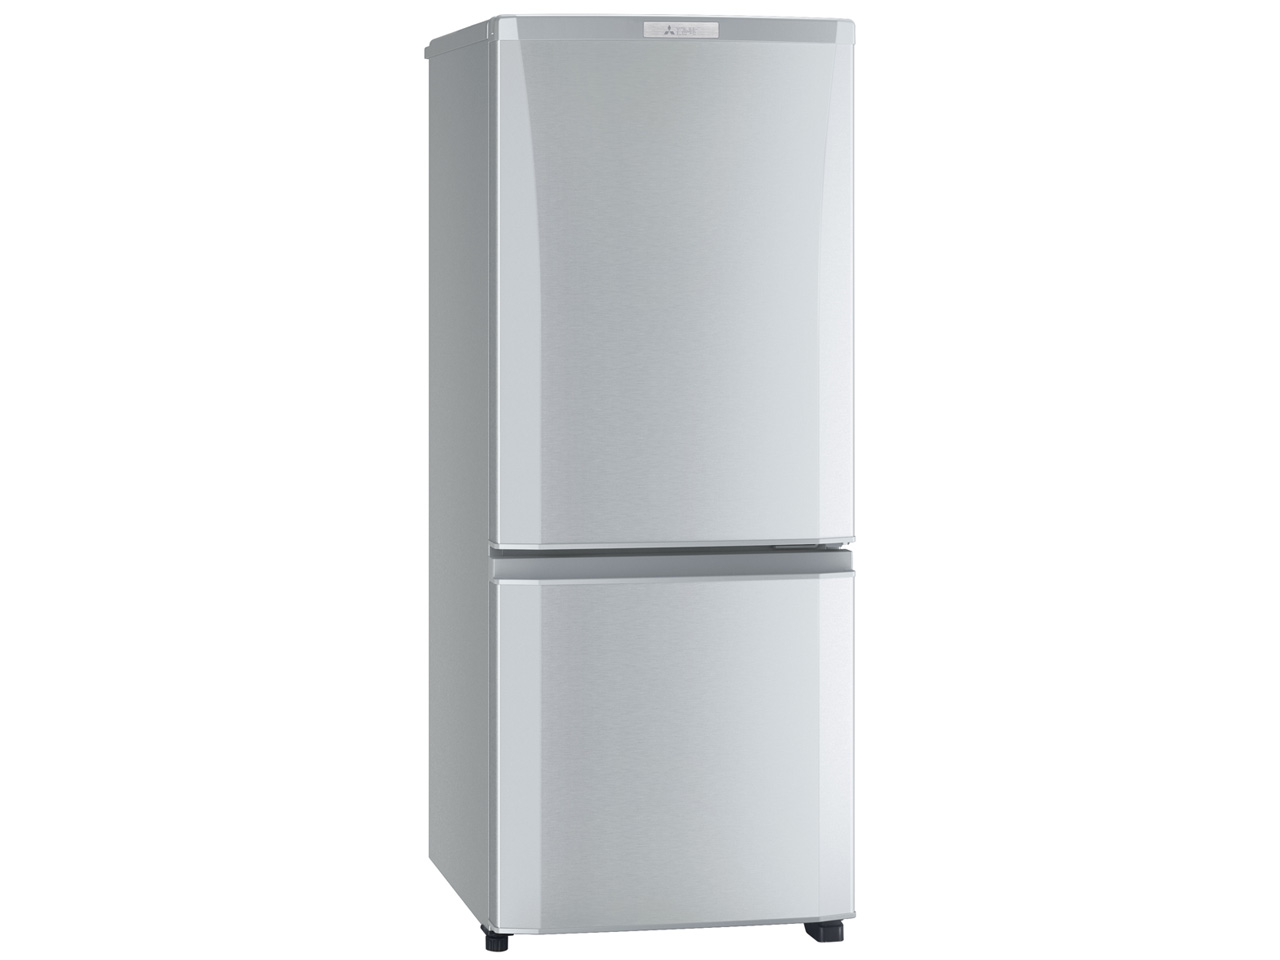 三菱 146L 2ドア冷蔵庫 MR-P15C-S 質量:38kg